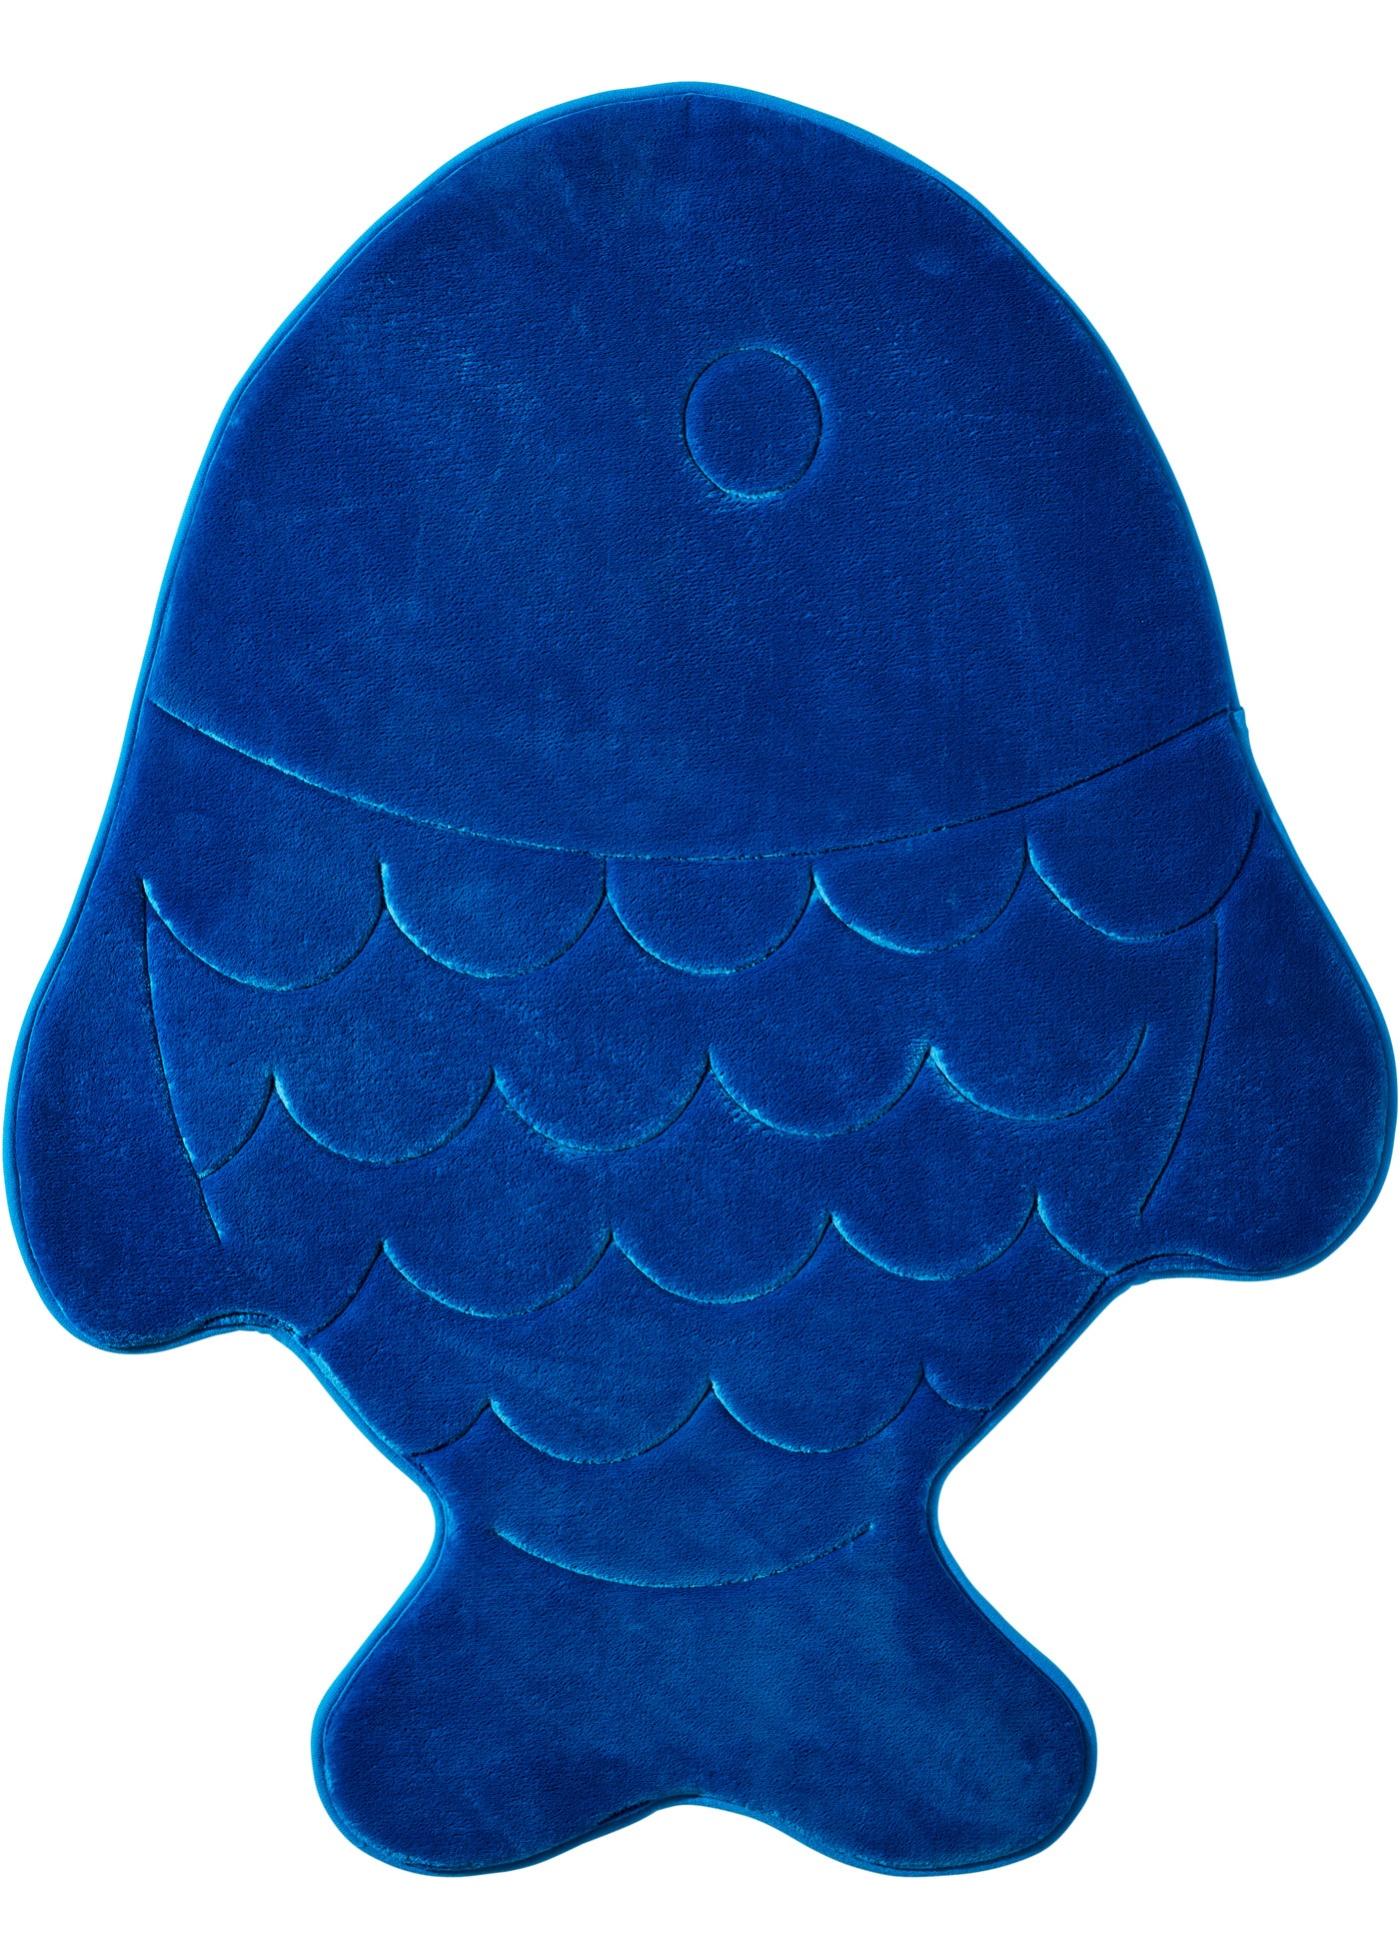 arredo bagno tappetino per bagno fisch in memory foam (blu) - bpc ... - Bonprix Arredo Bagno